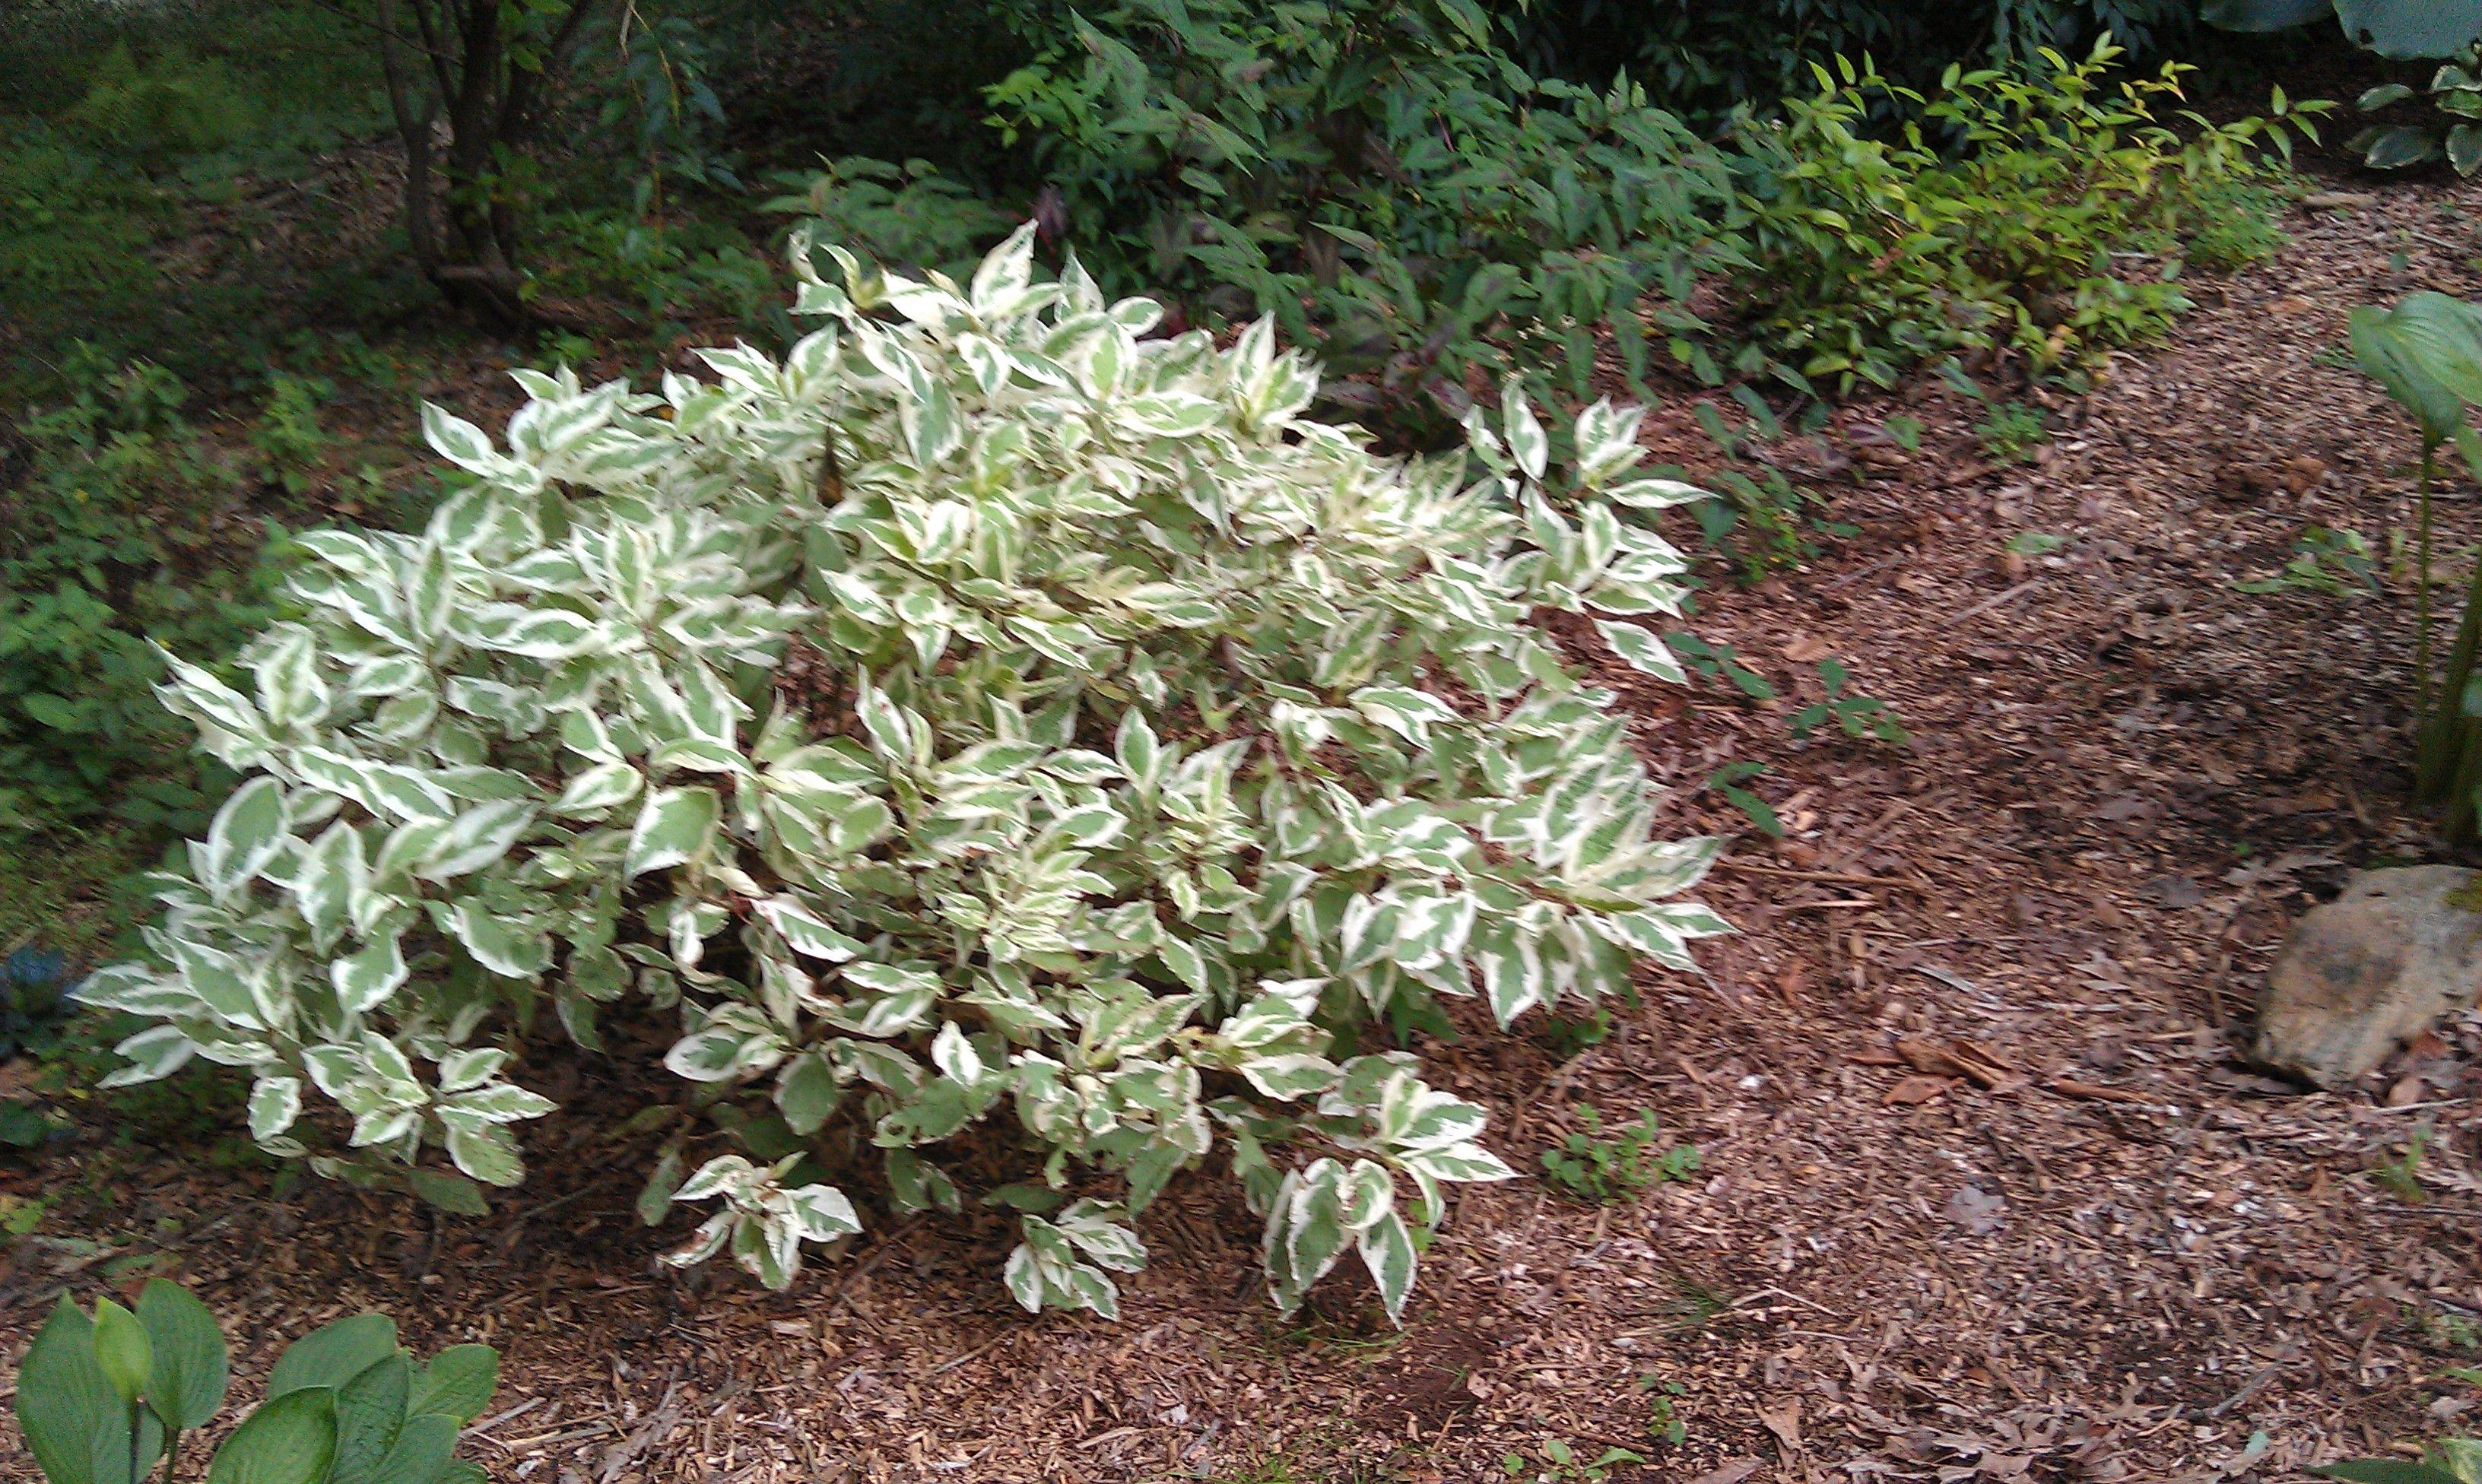 Variegated dogwood shrub in my garden | Garden Beauties ... Variegated Dogwood Tree